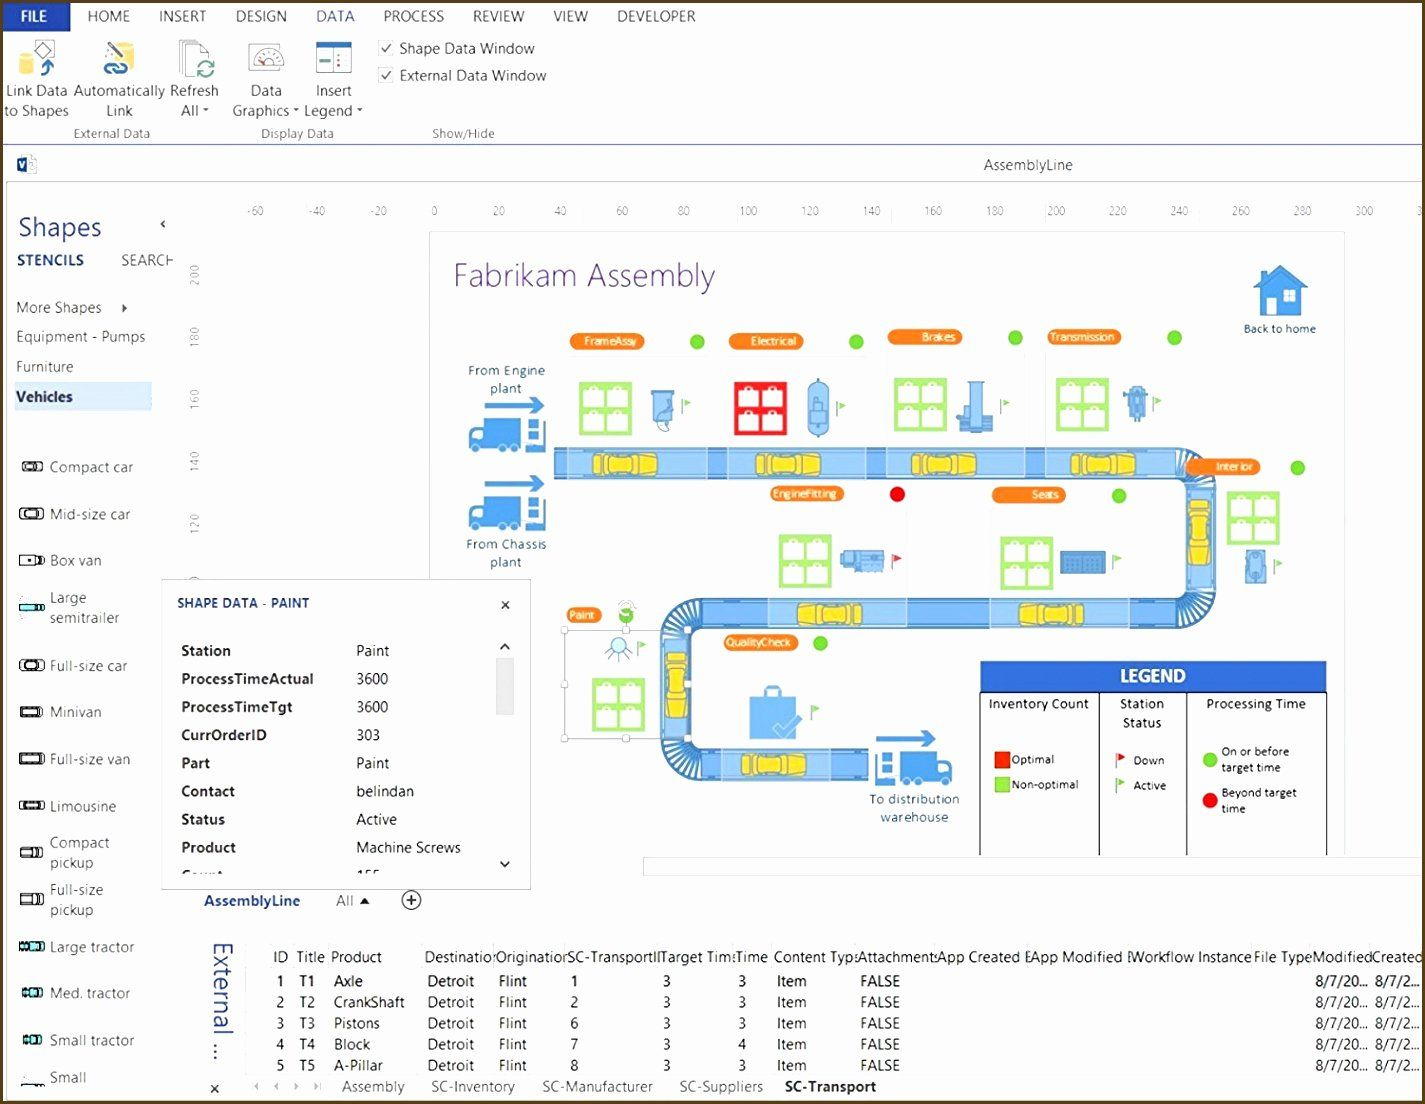 Visio Flow Chart Template Beautiful 19 Visio Cross Functional Flowchart Template Microsoft Visio Flow Chart Template Diagram